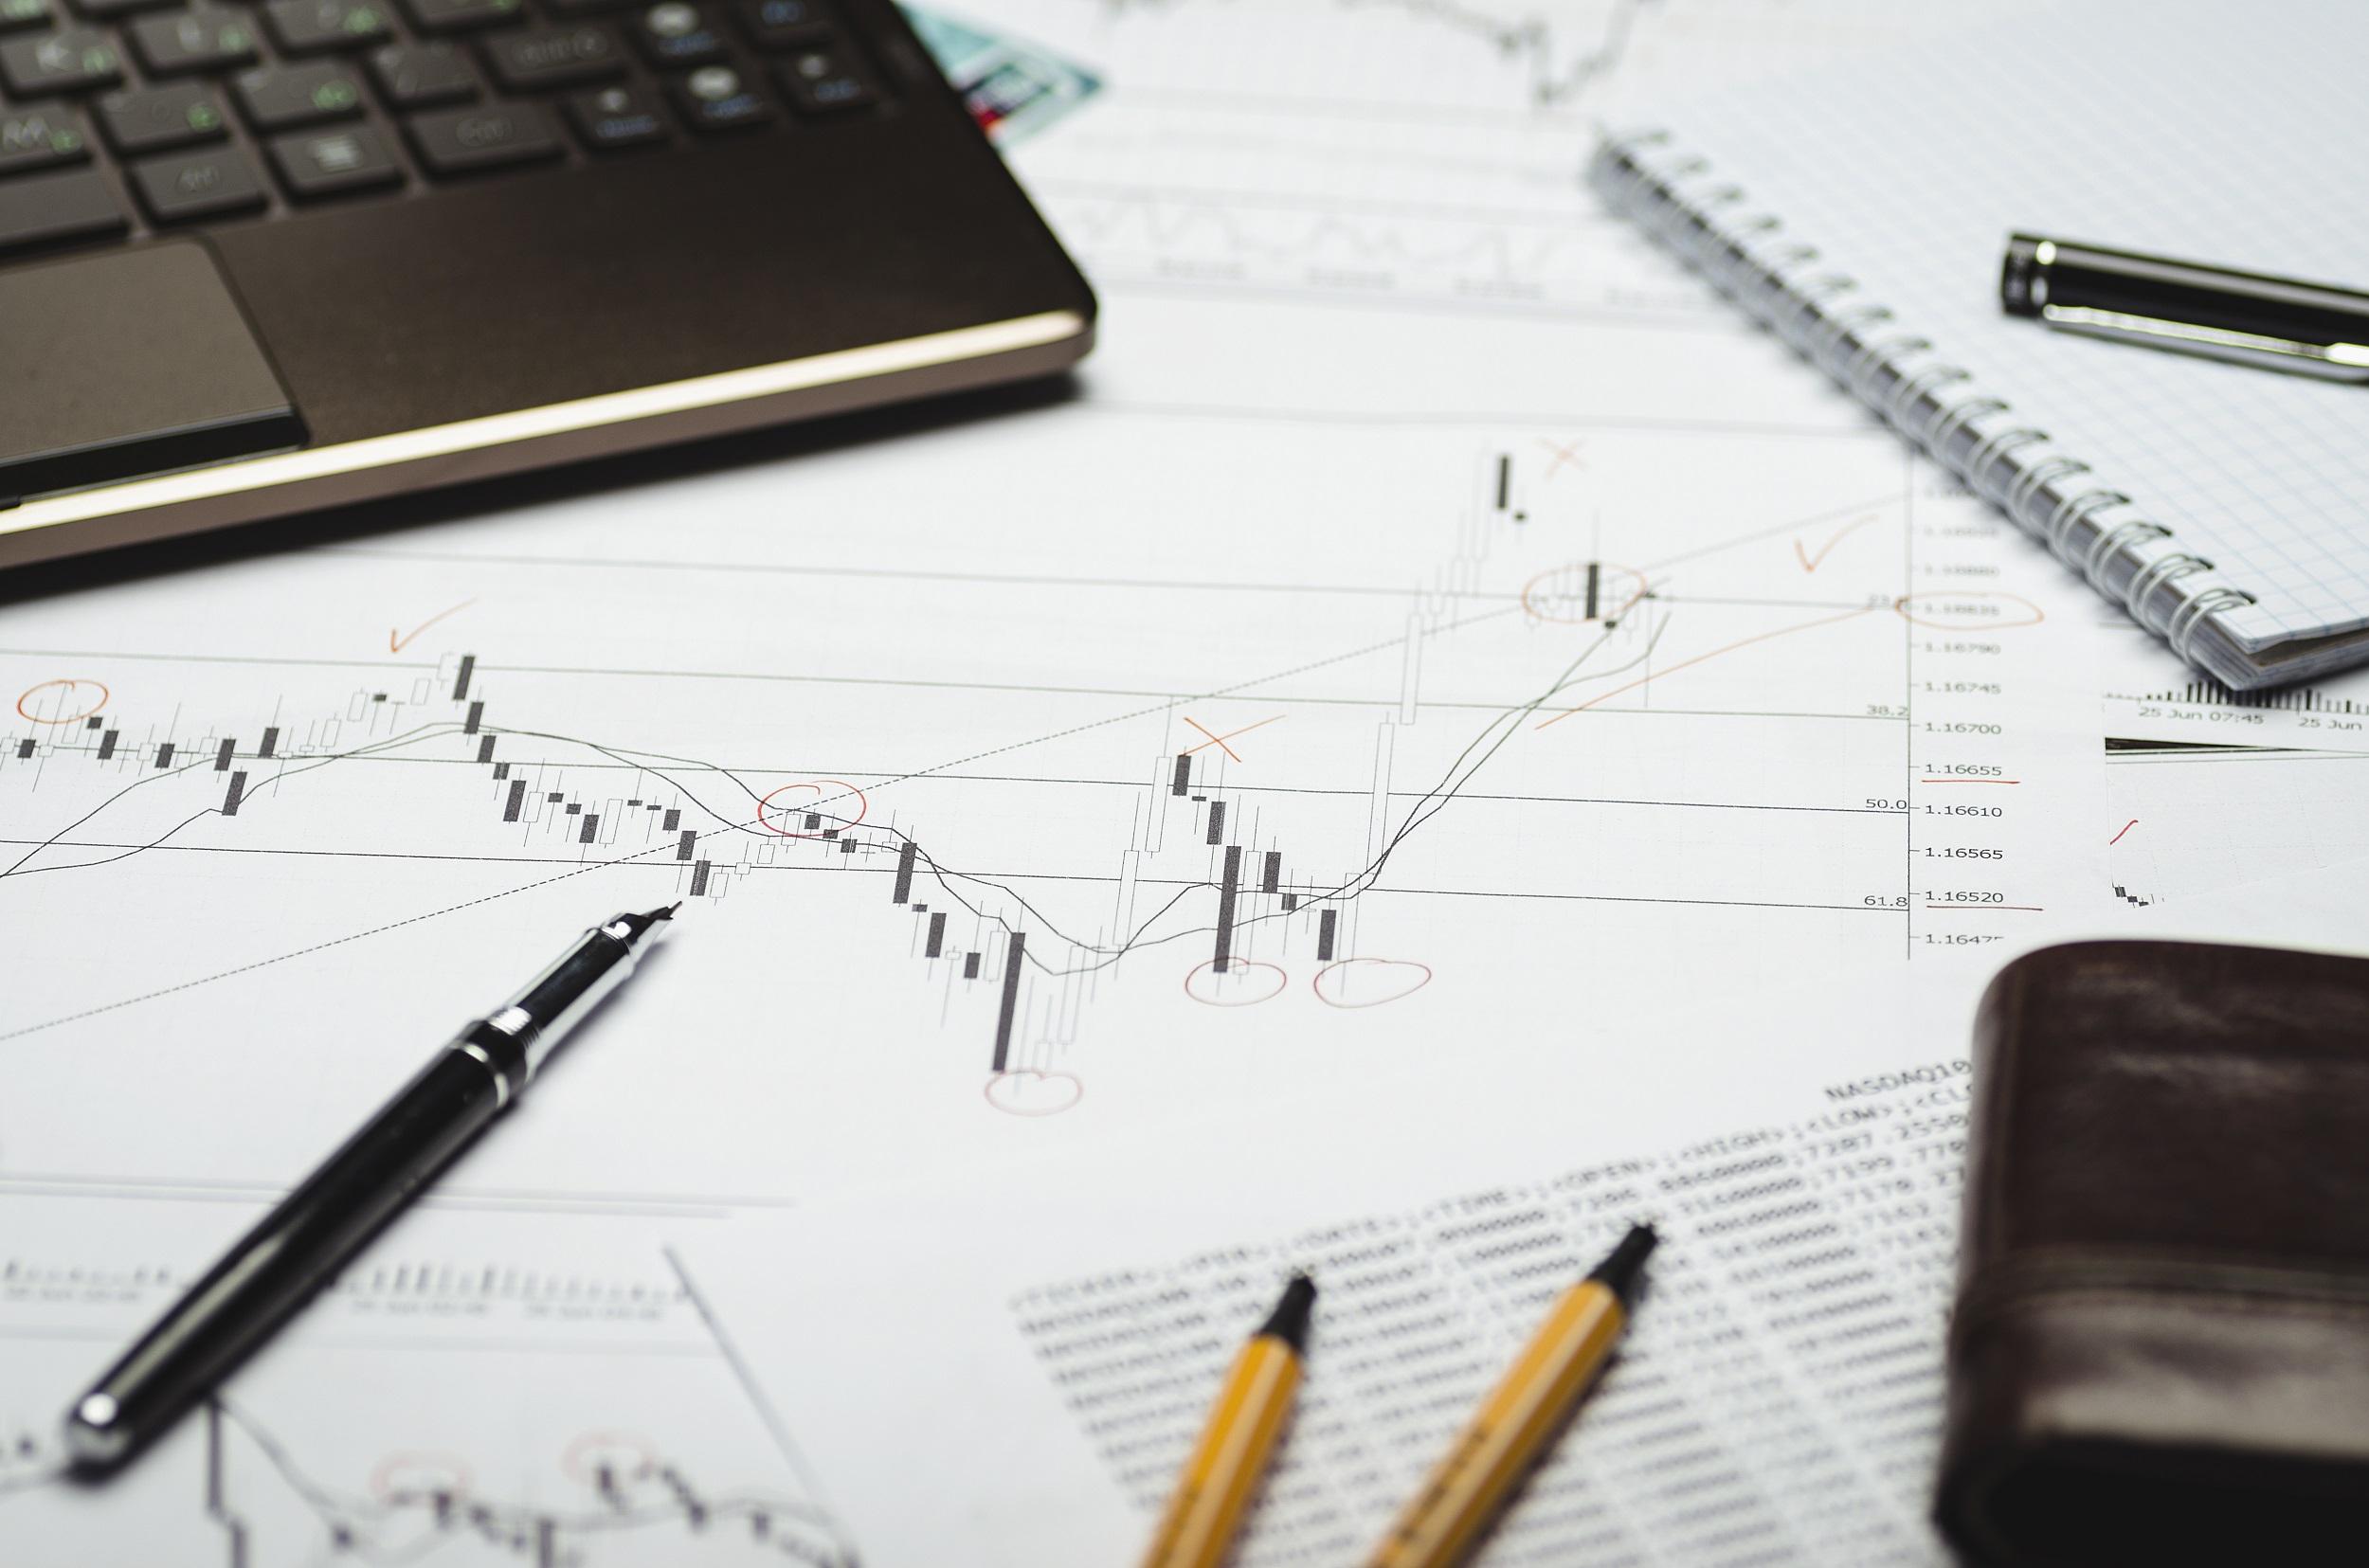 Profit margin chart on paper